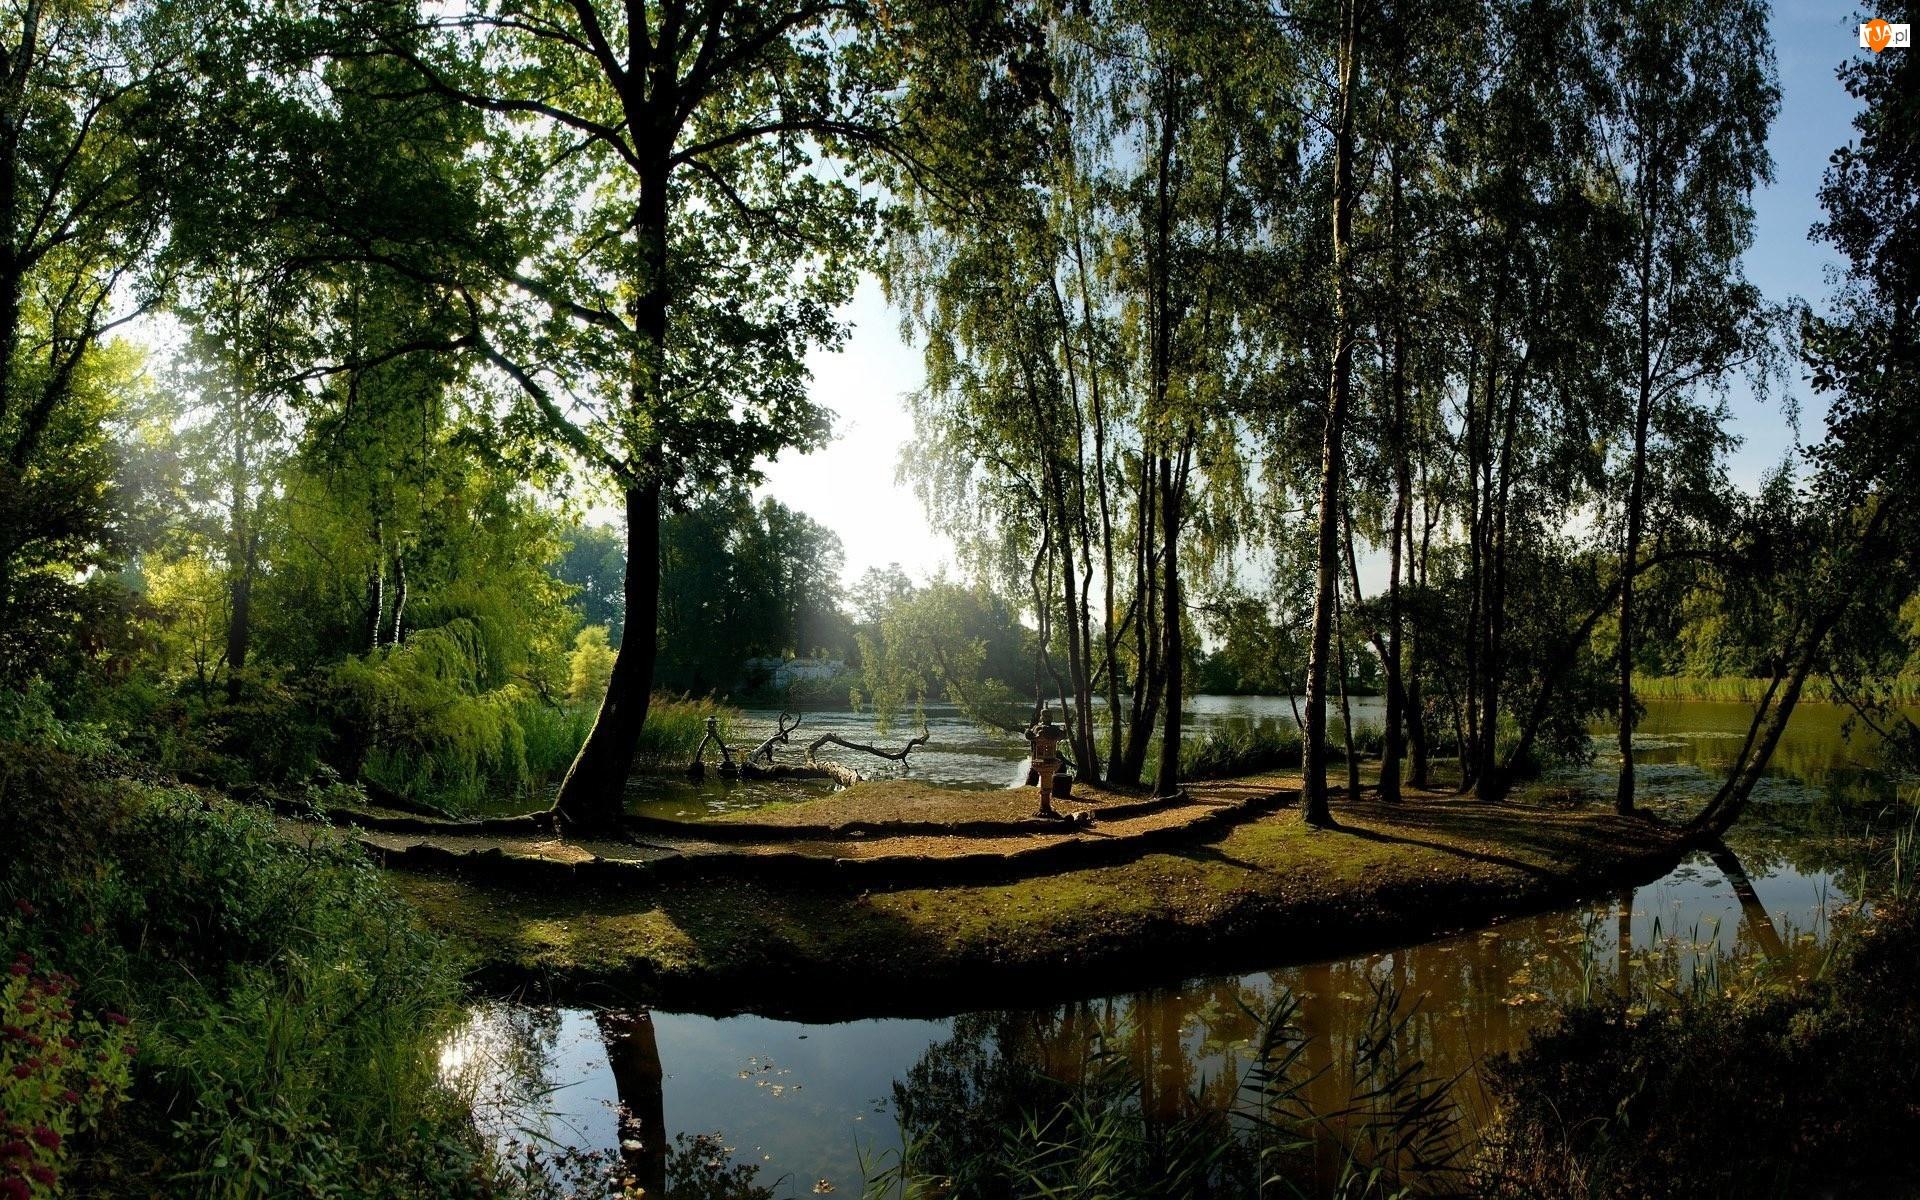 Jeziorko, Park